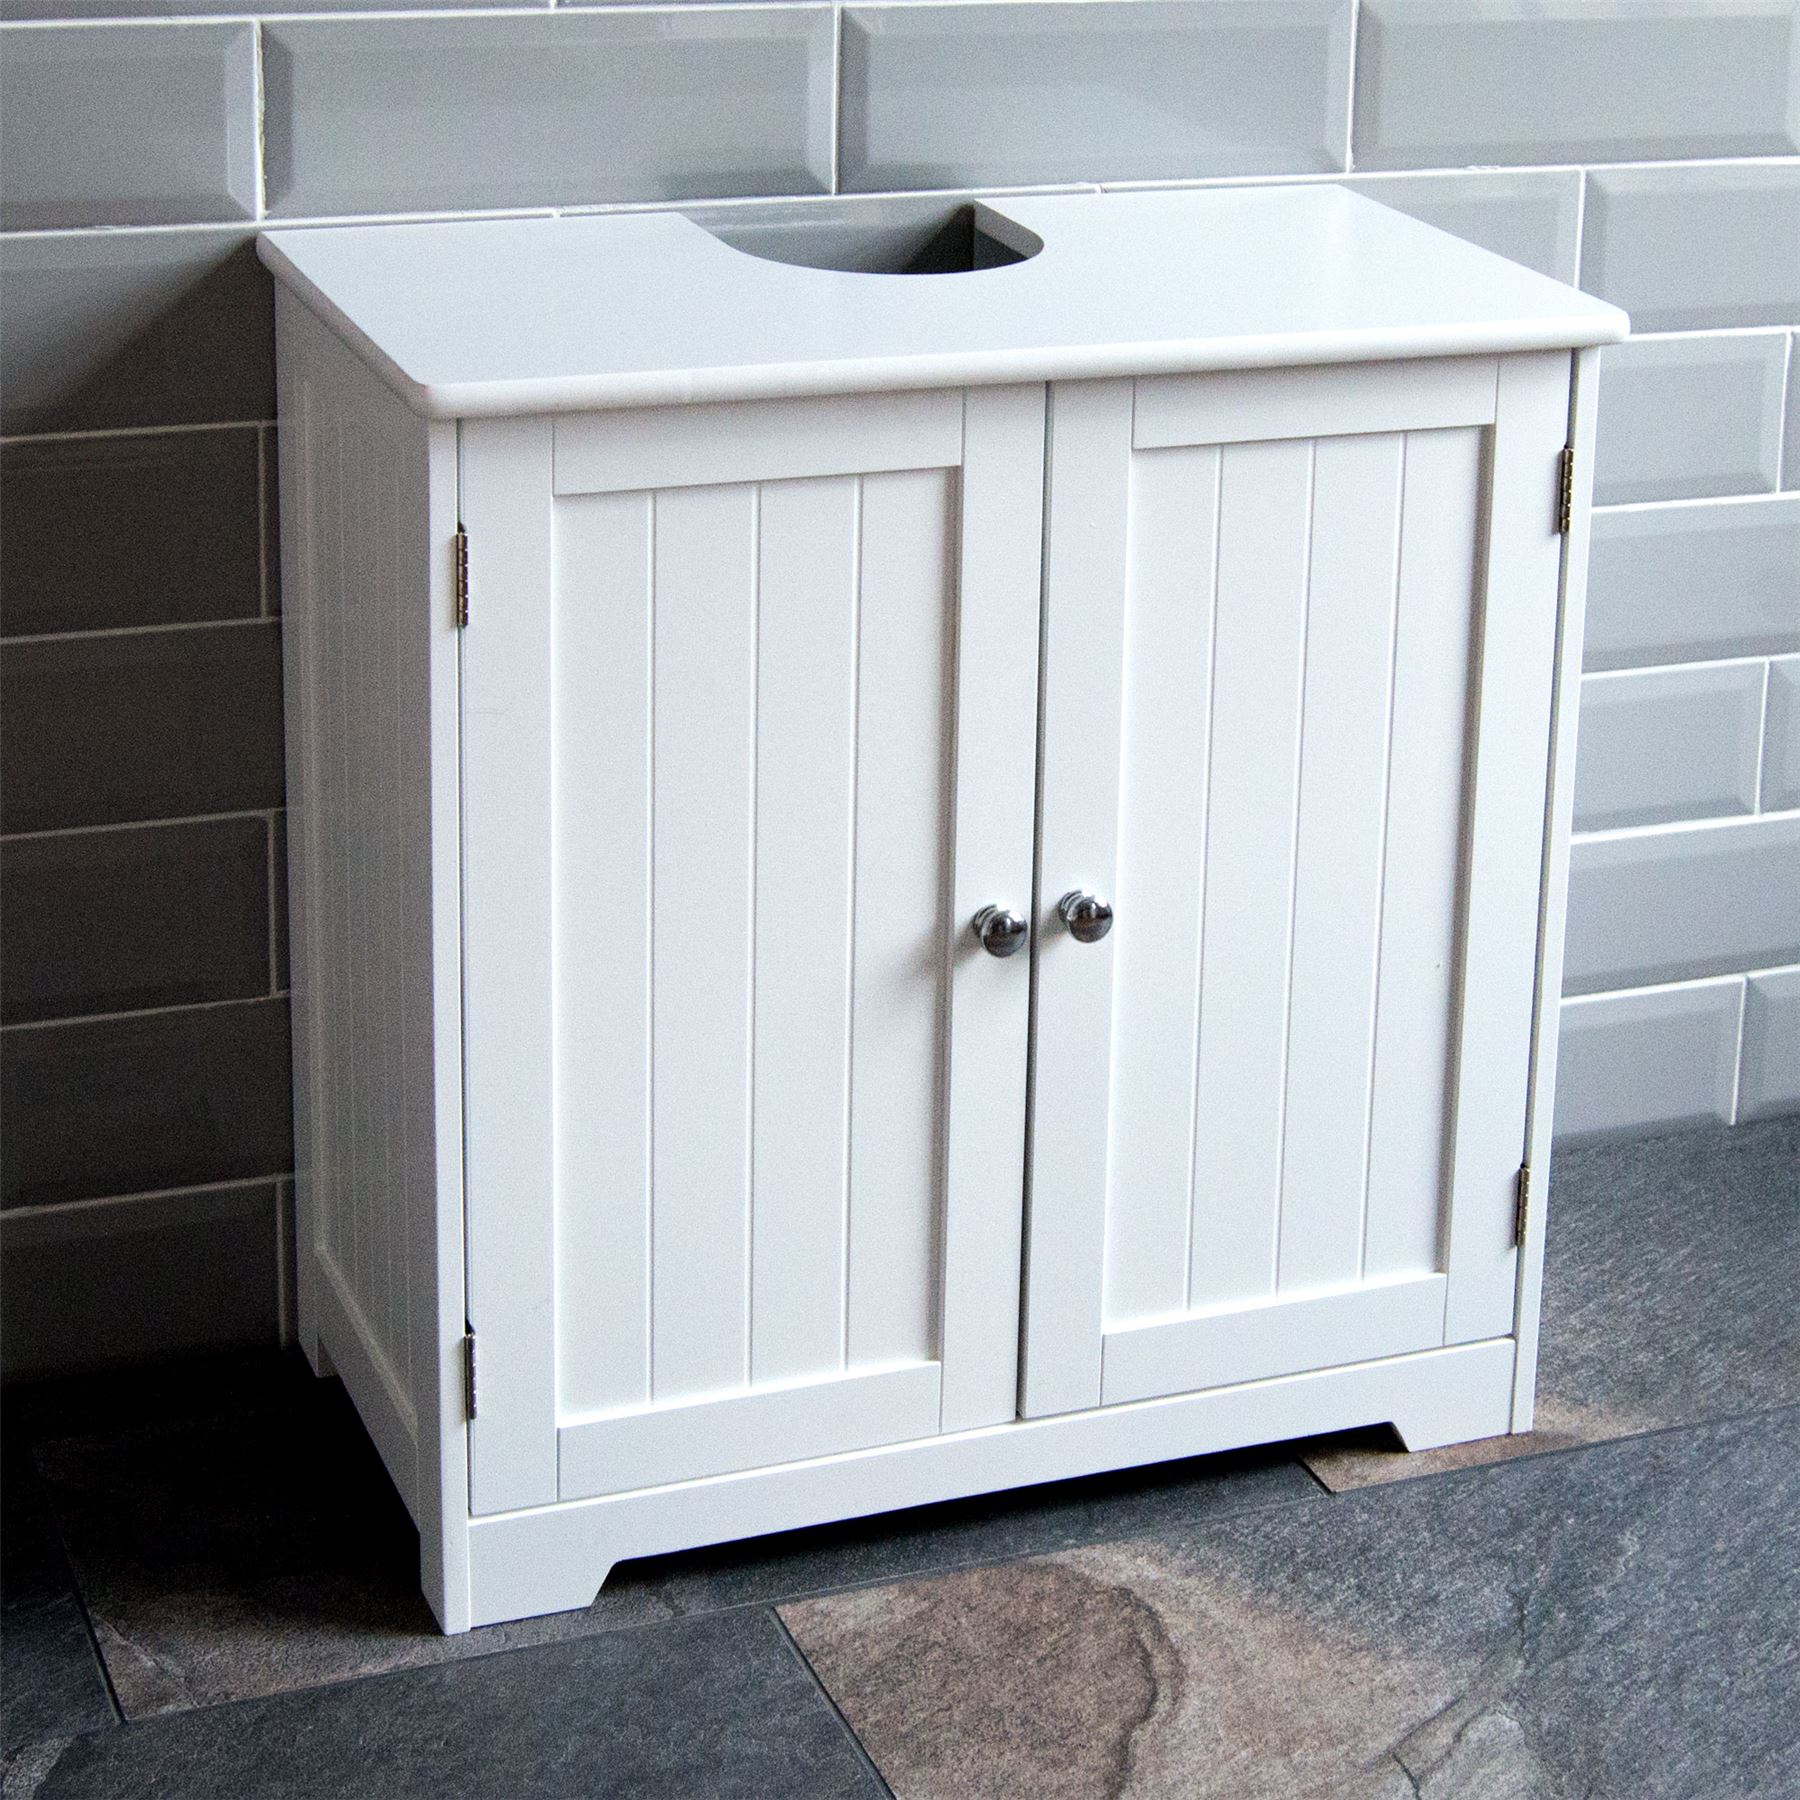 Details About Priano Bathroom Sink Cabinet Under Basin Unit Cupboard Storage Furniture White regarding measurements 1800 X 1800